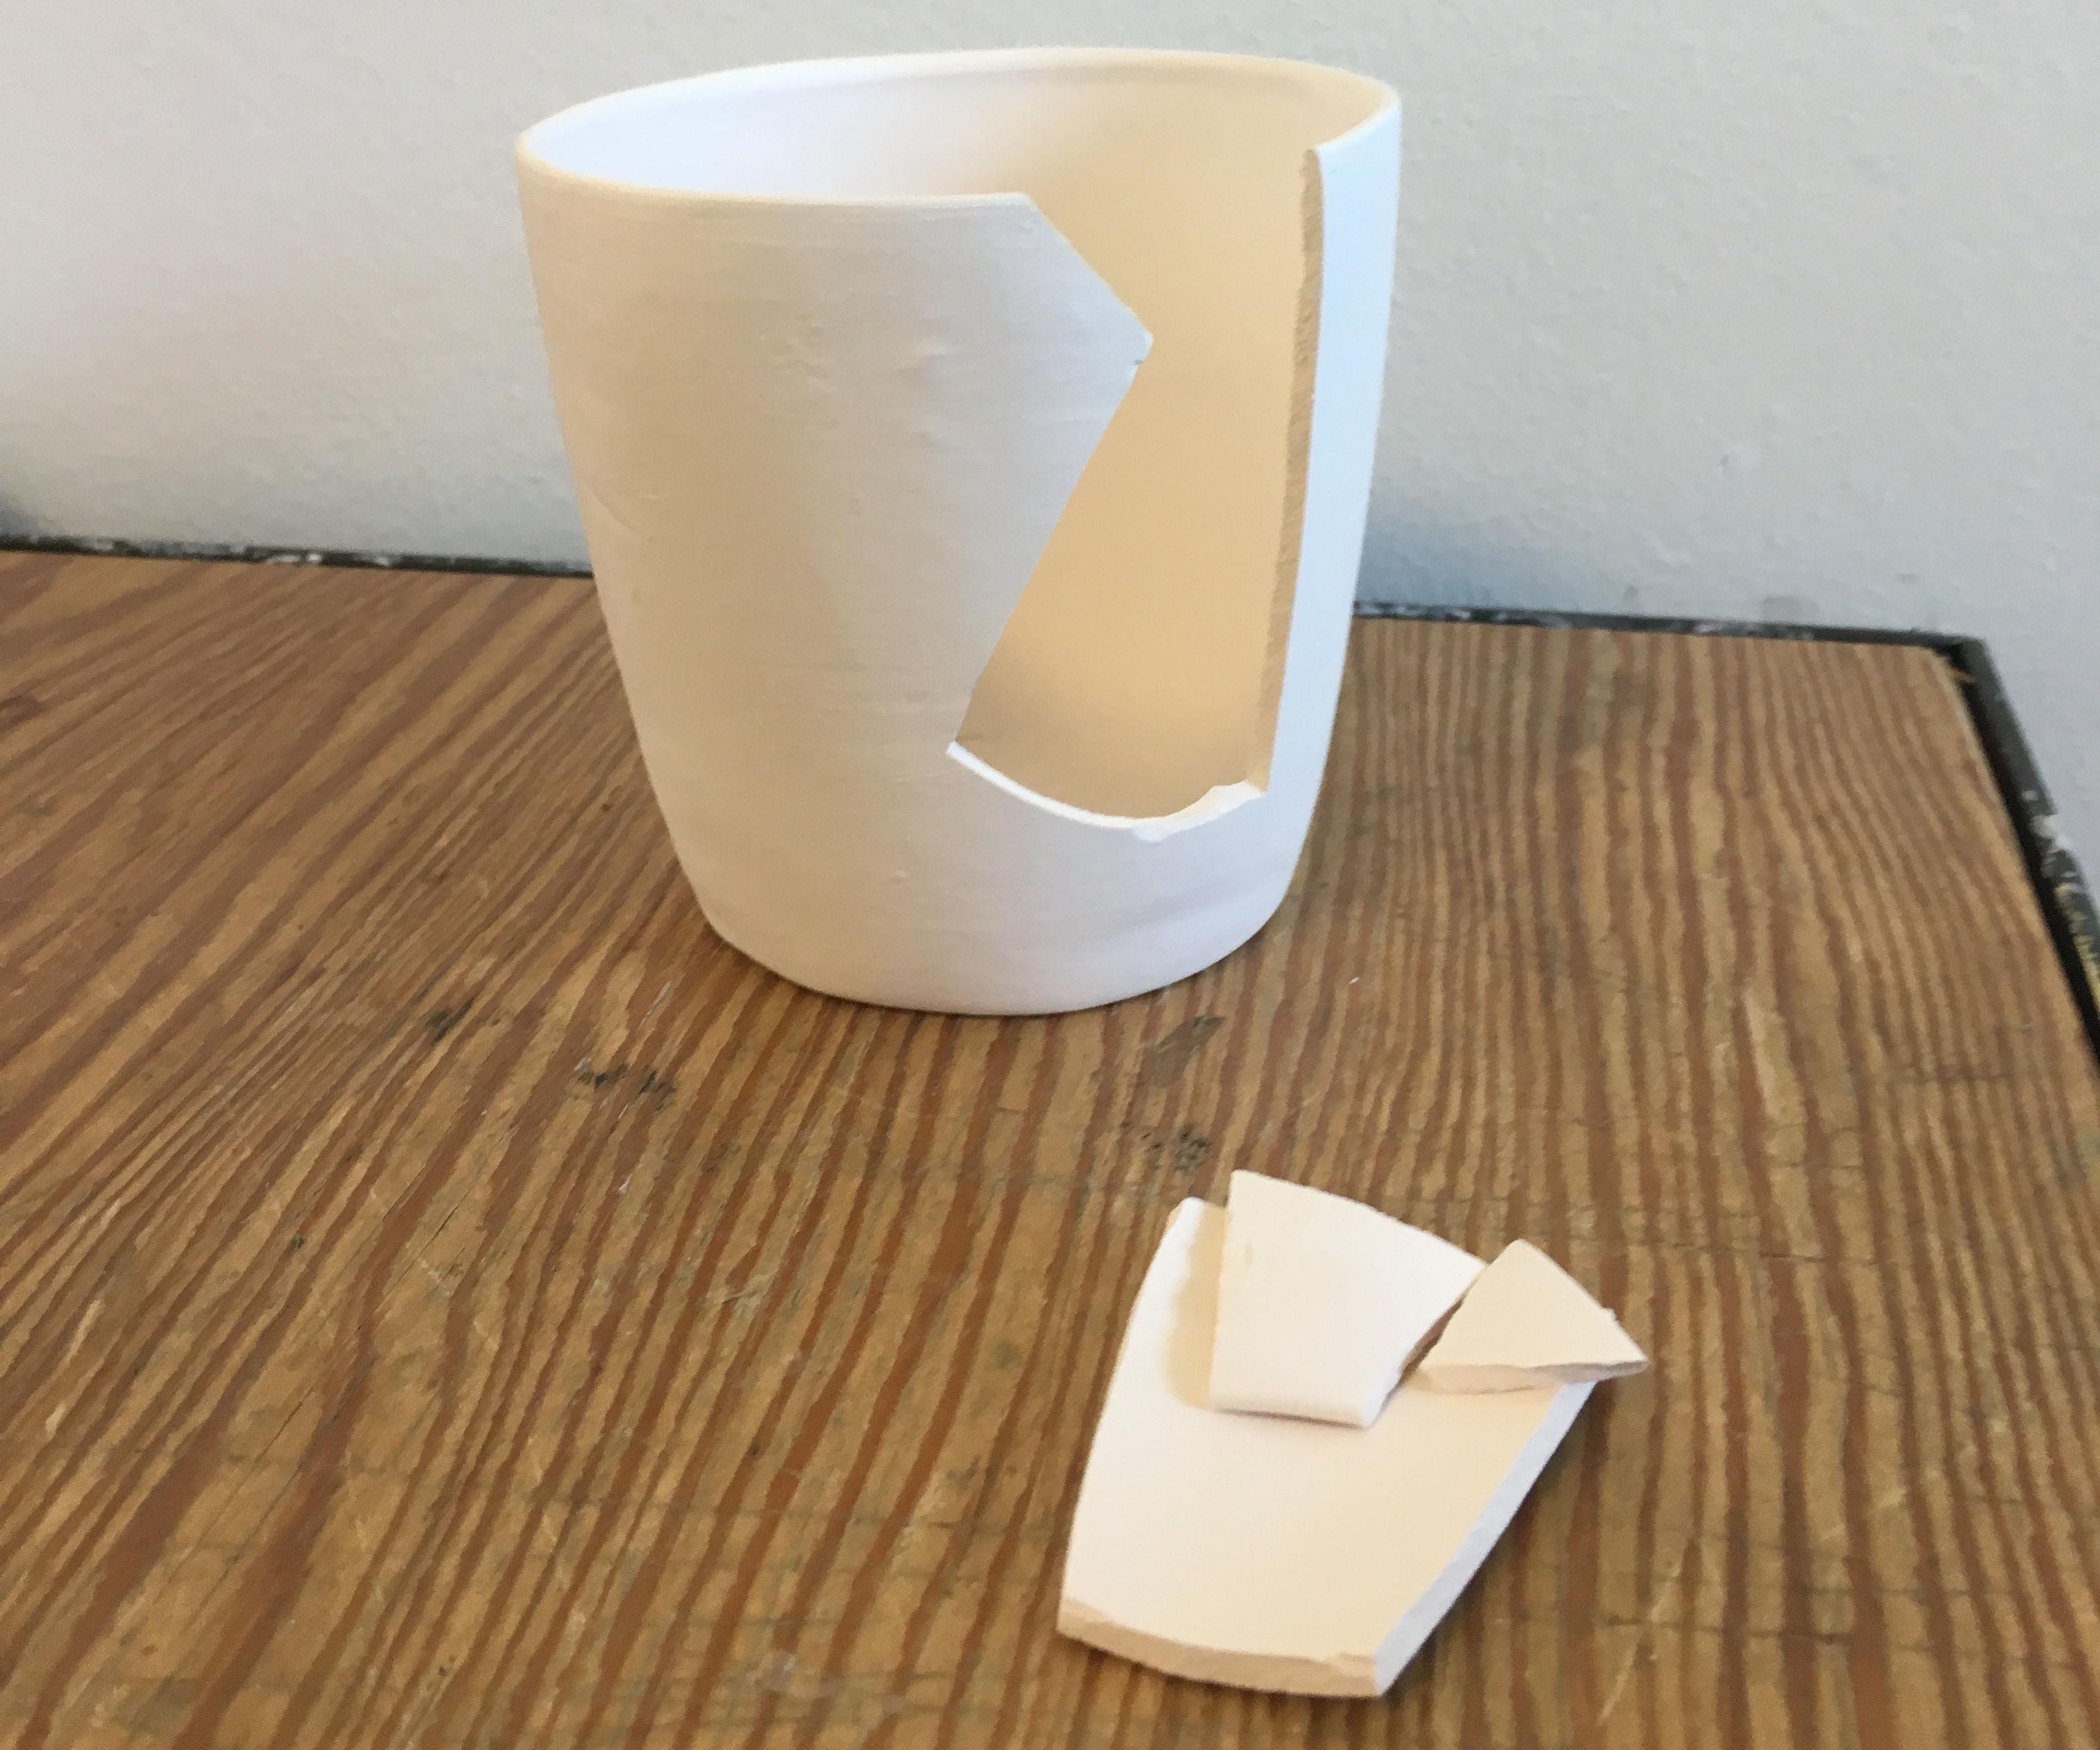 FIX BROKEN PORCELAIN CUP